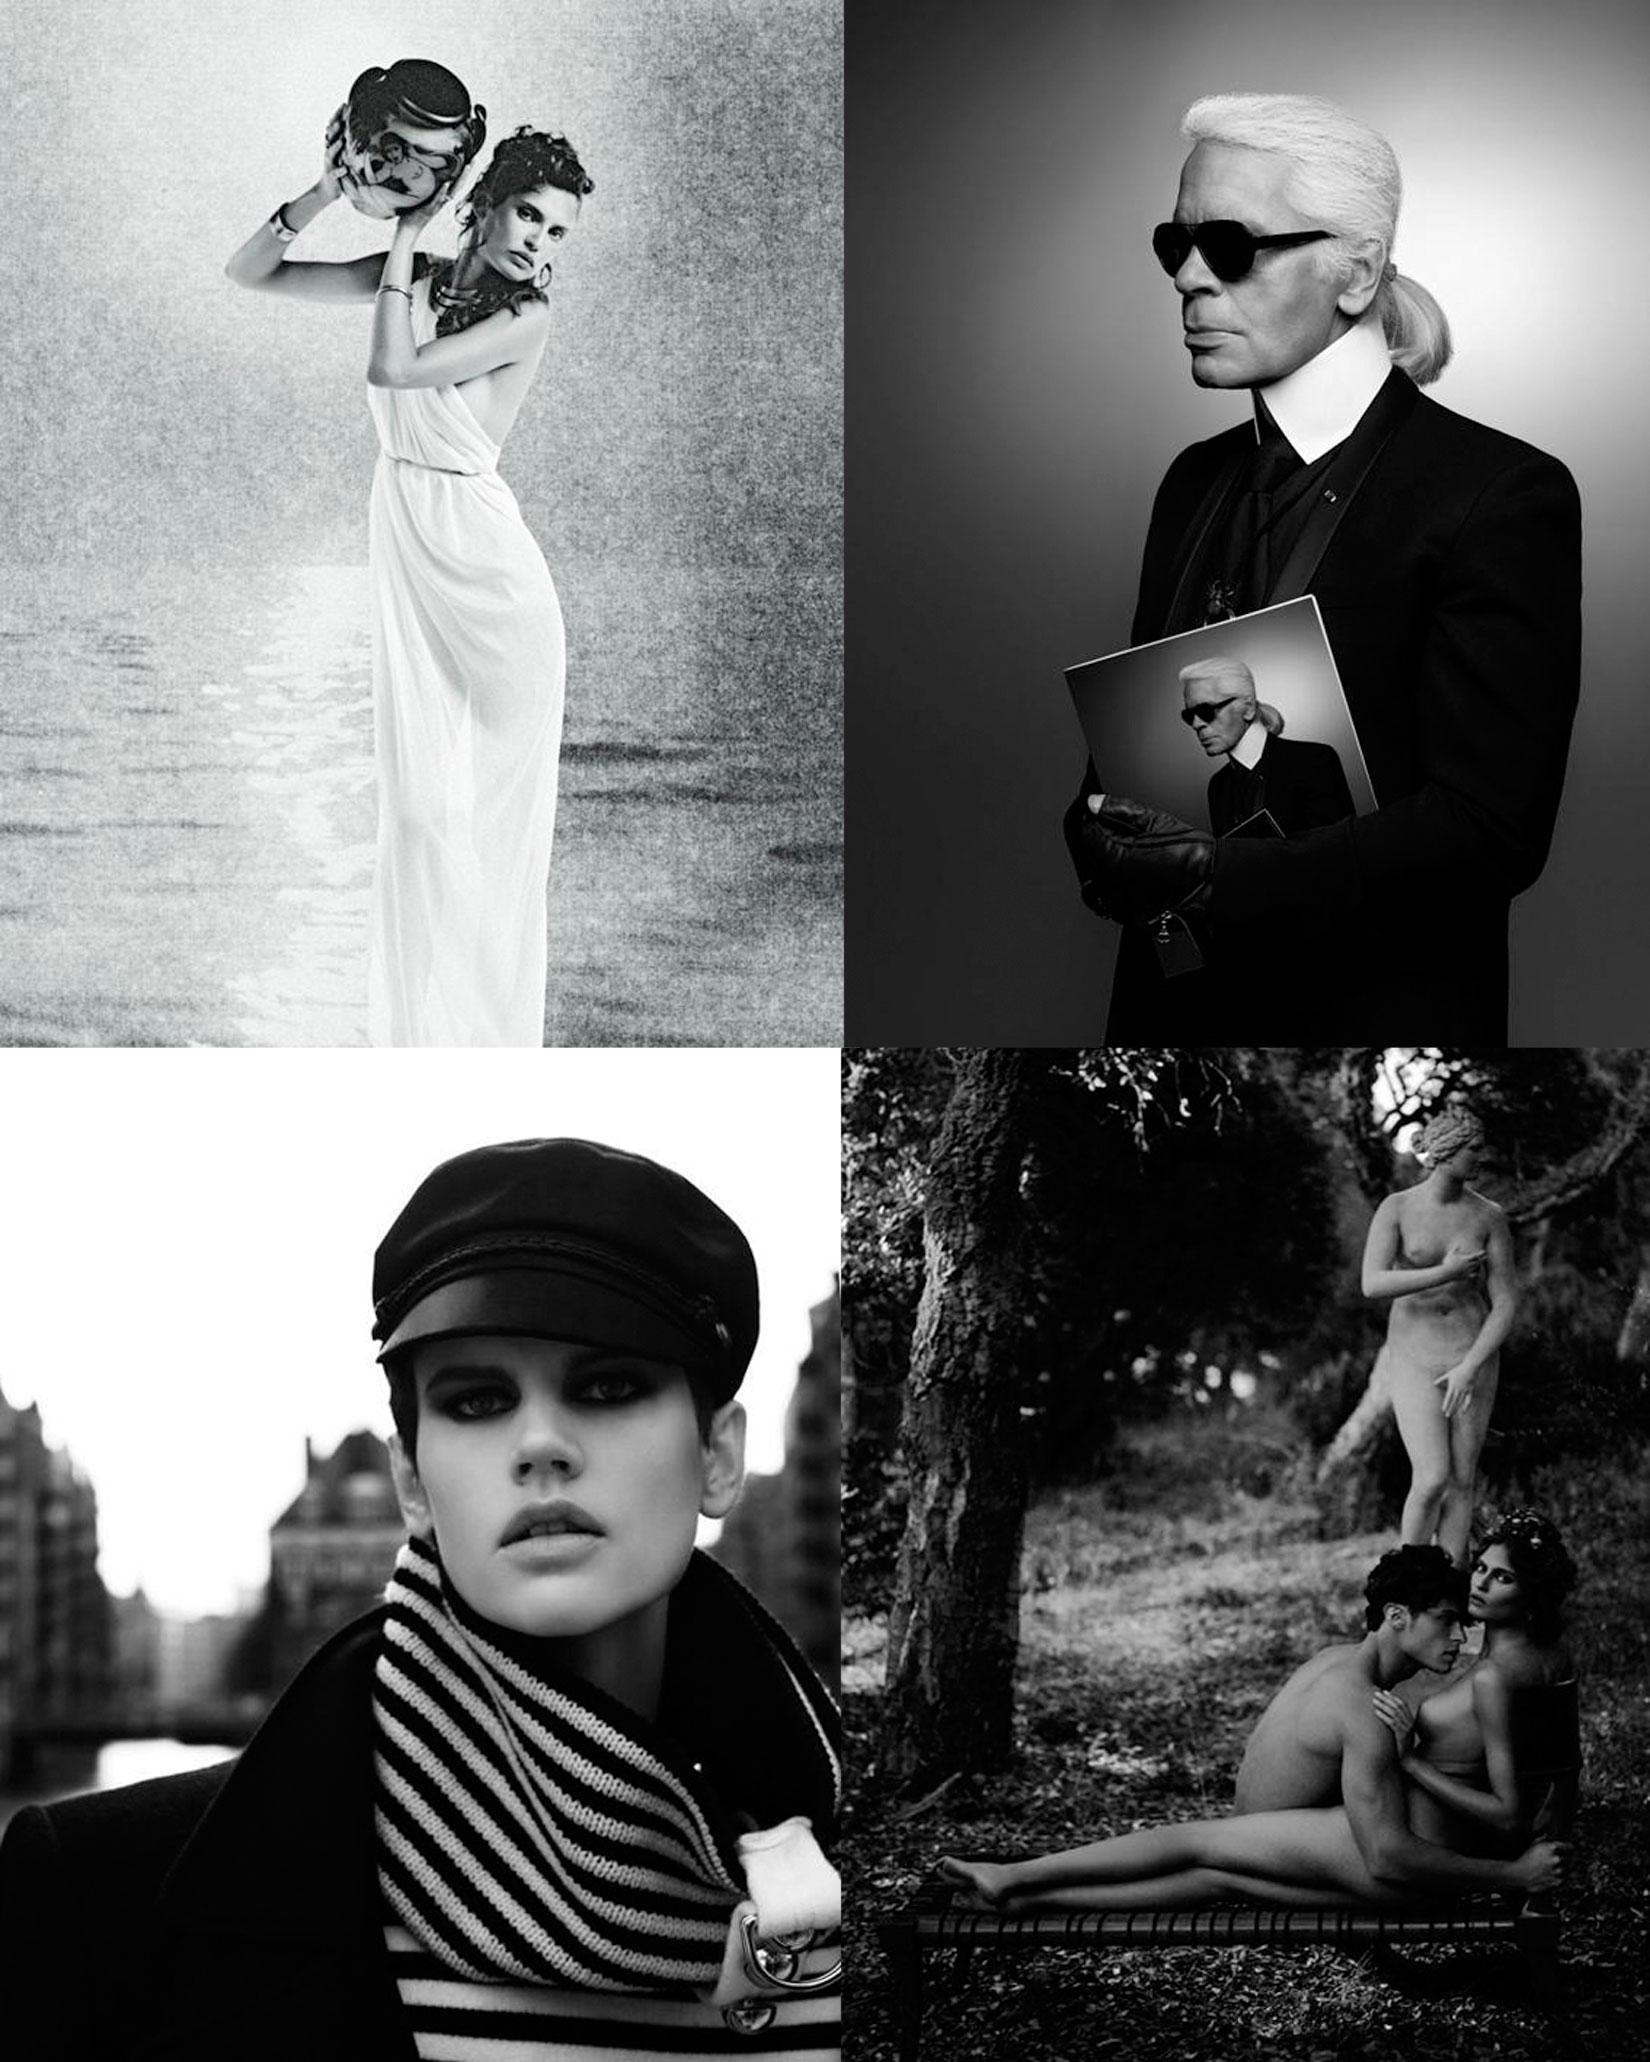 Karl Lagerfeld photos